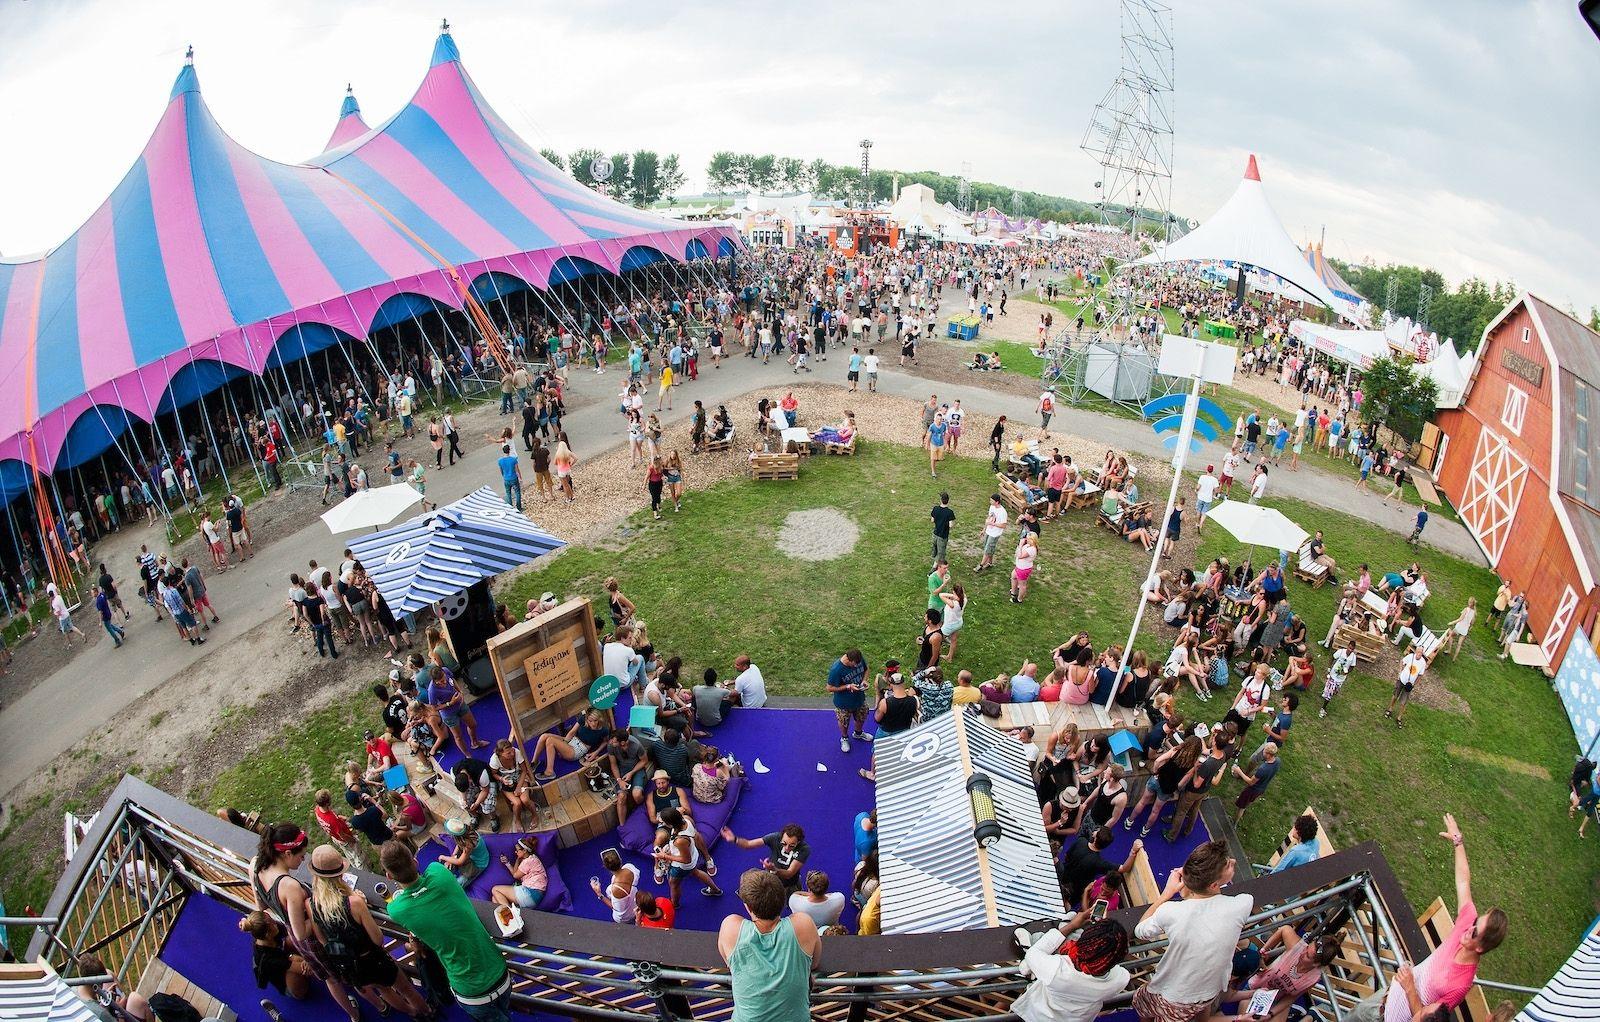 Lowlands kabinet meerdaagse festivals festivalzomer 2021 kort geding evenementen